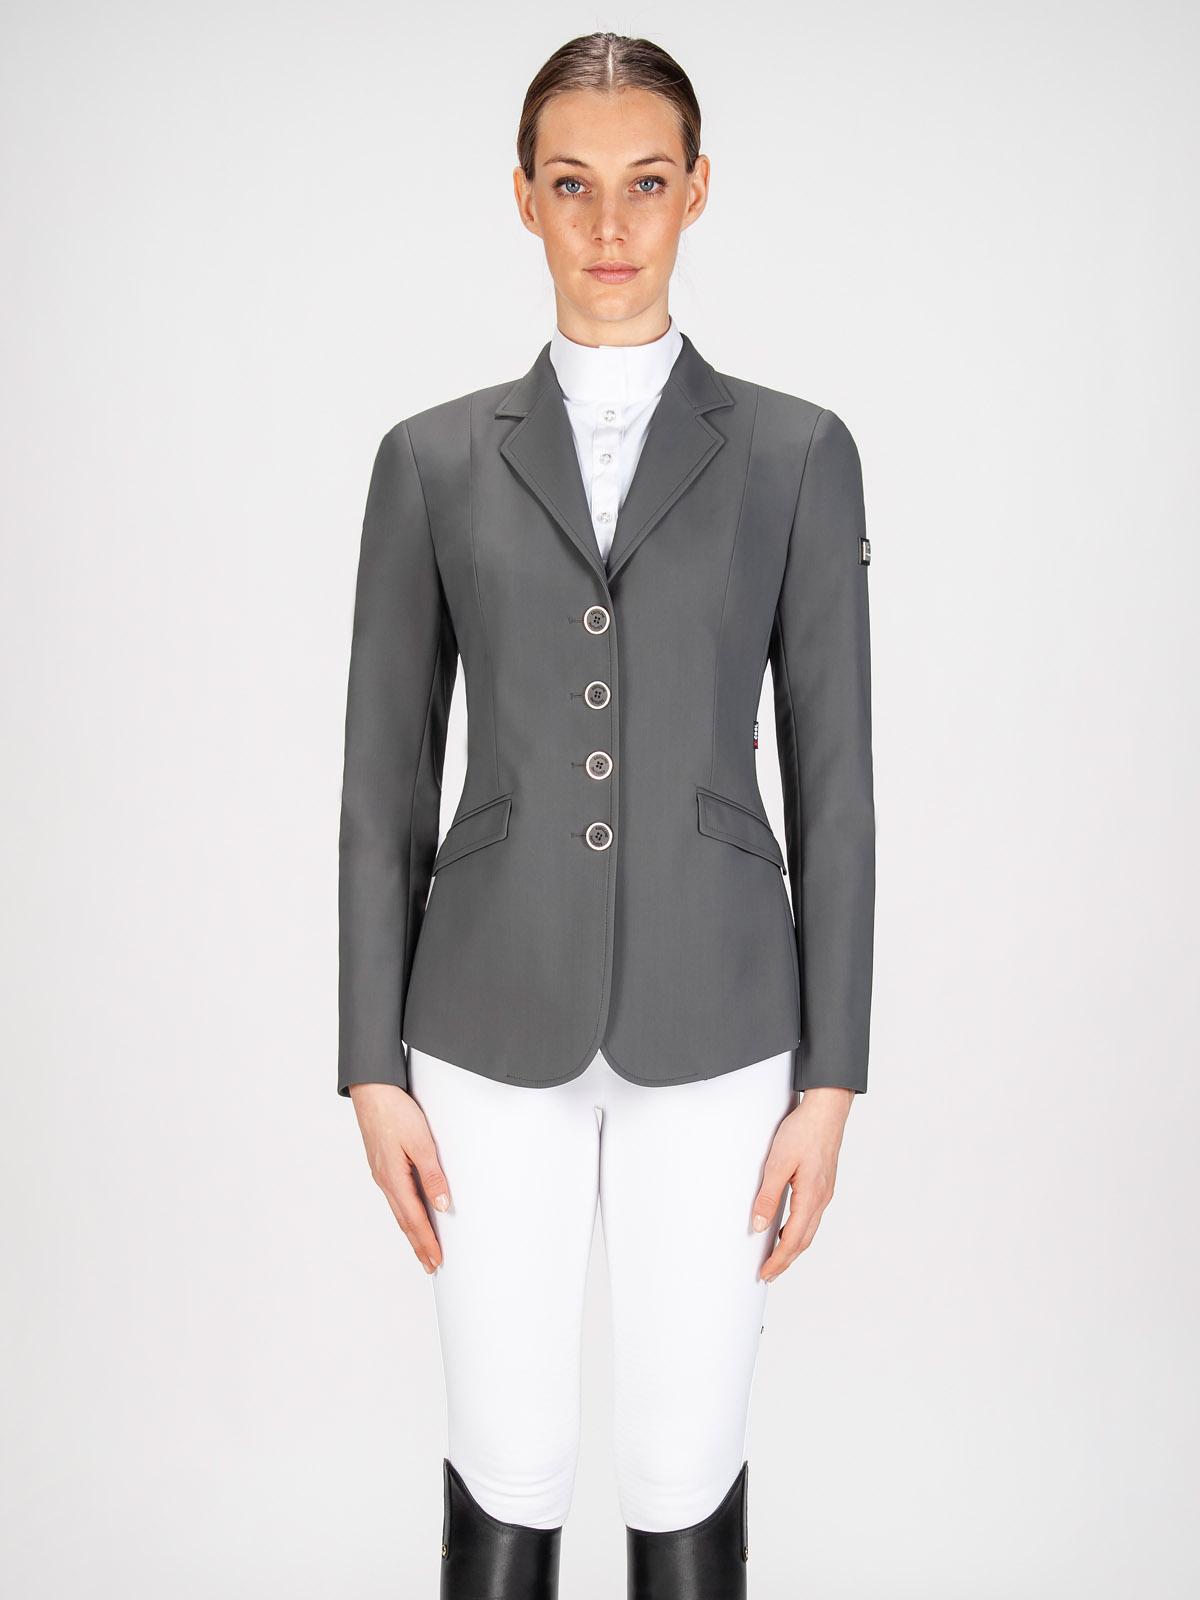 Gait women's show coat in X-Cool Evo performance fabric grey